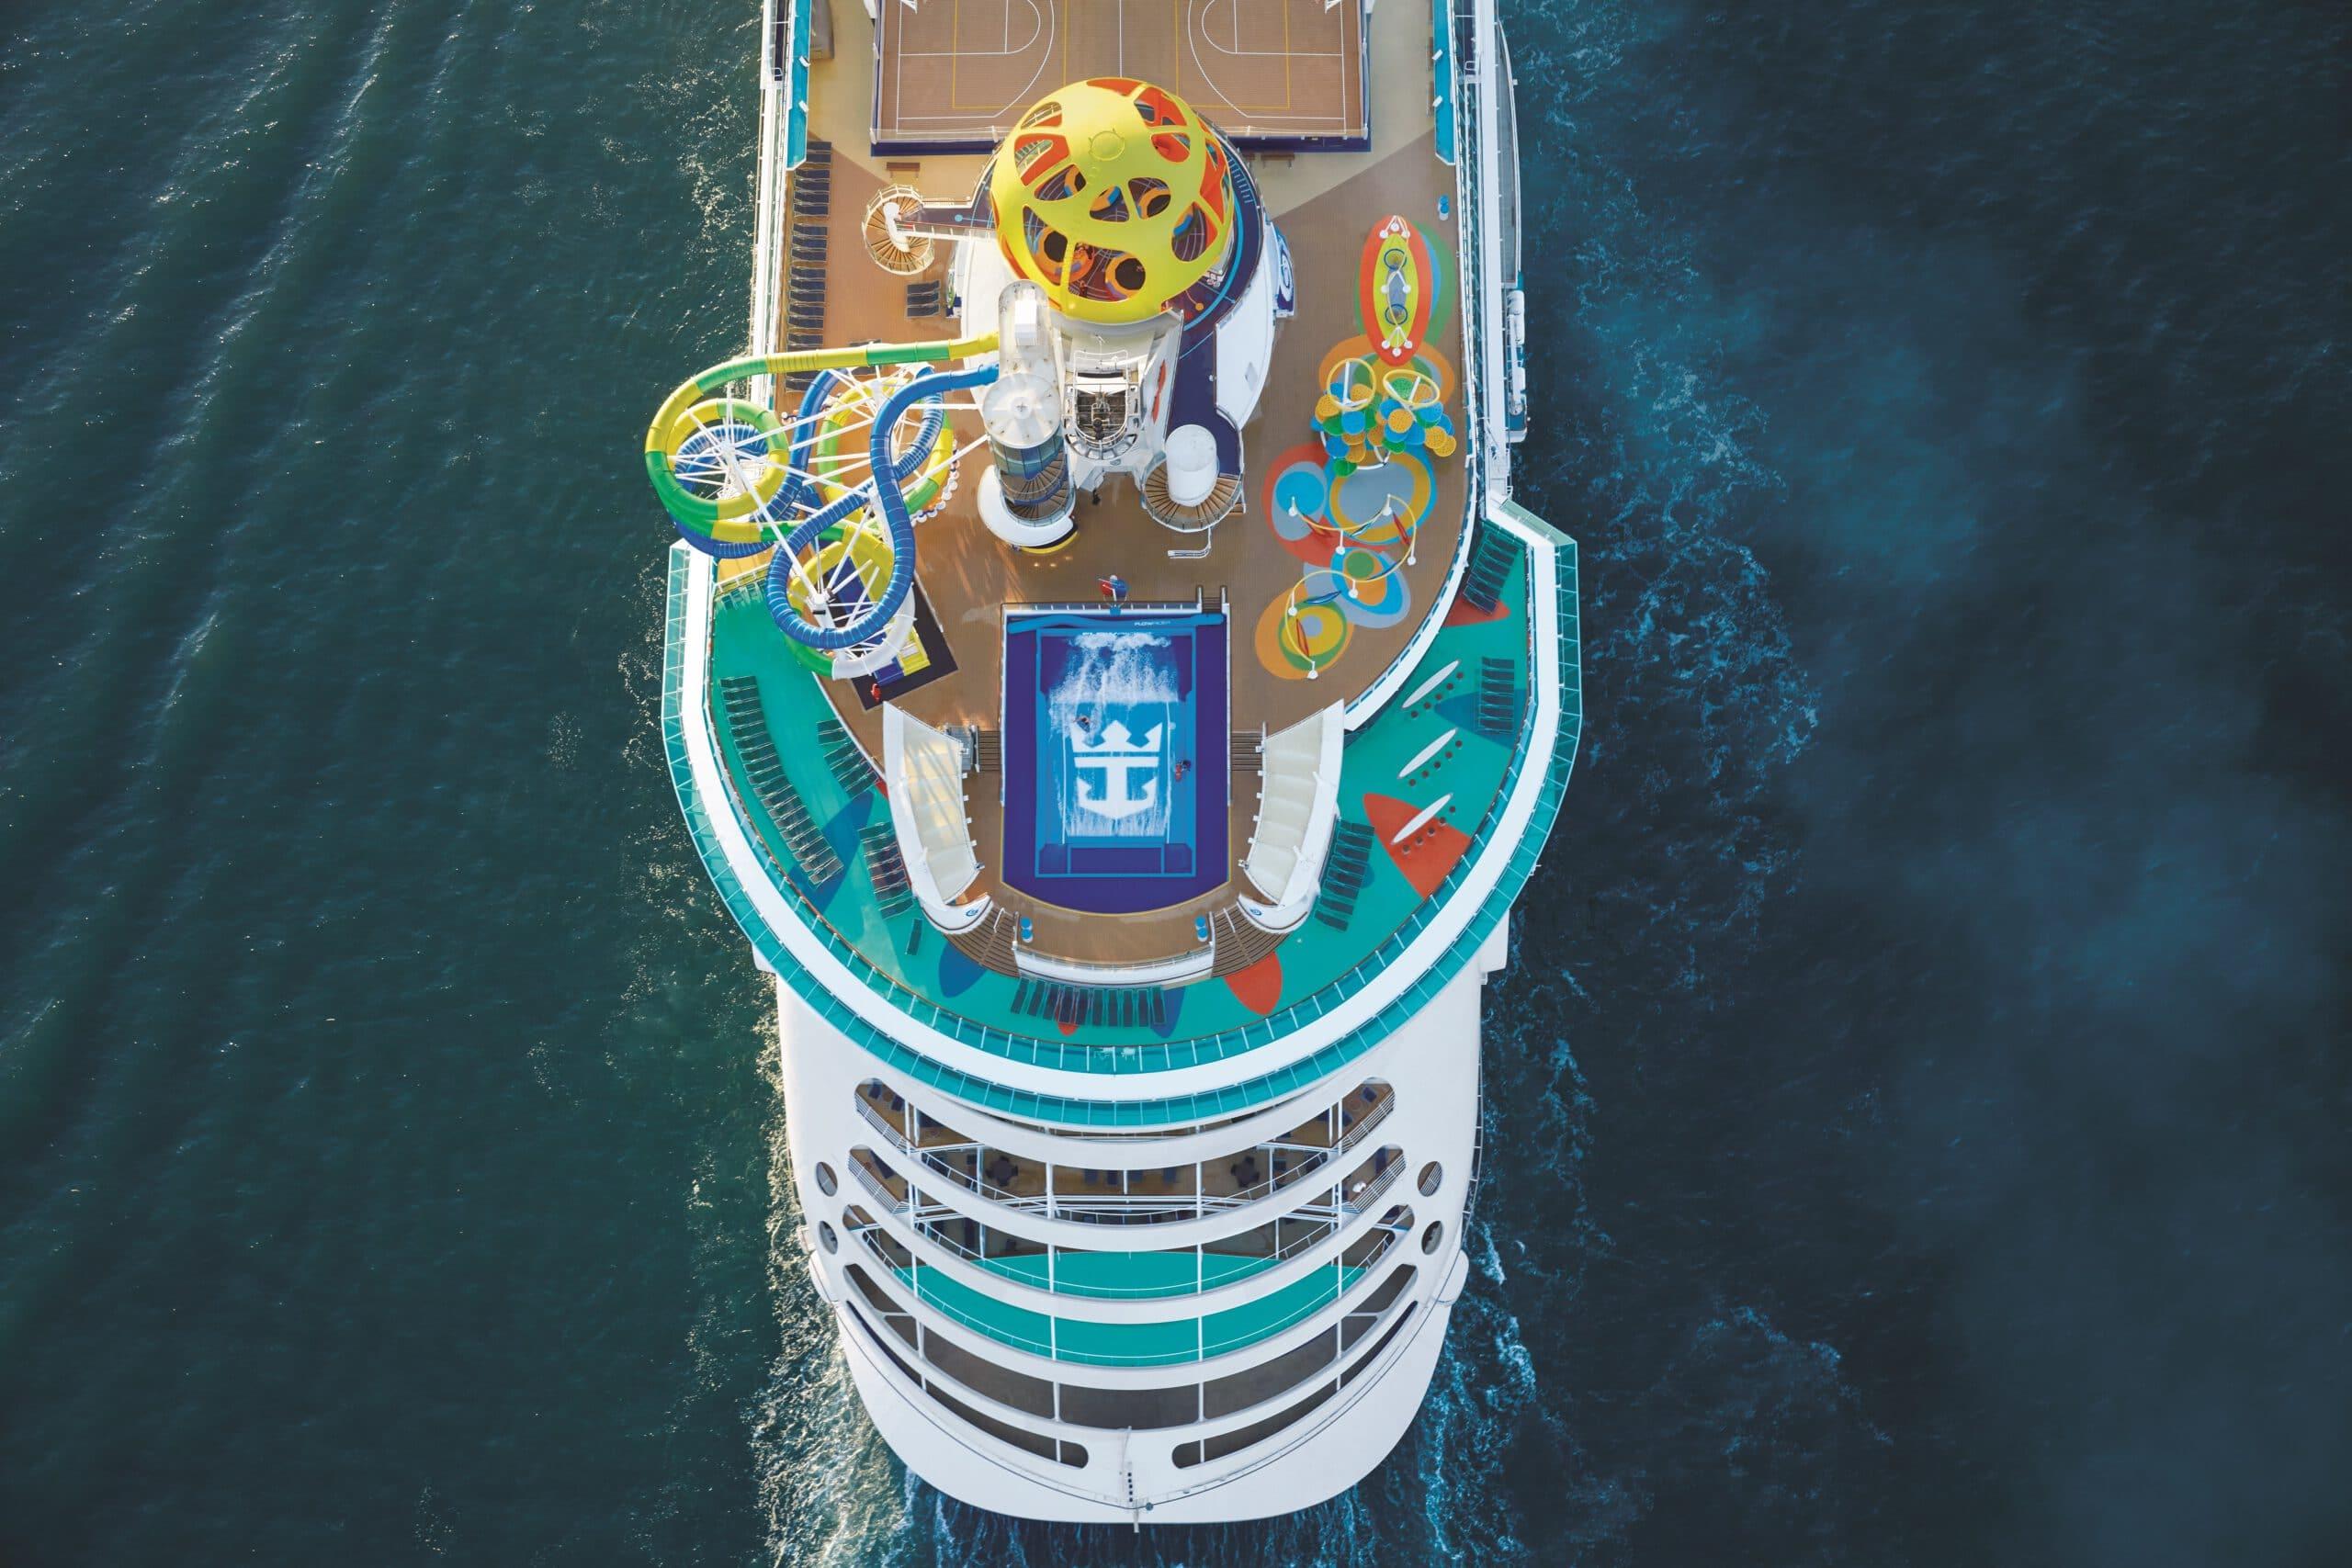 Cruiseschip-Independence of the Seas-Royal Caribbean International-Schip